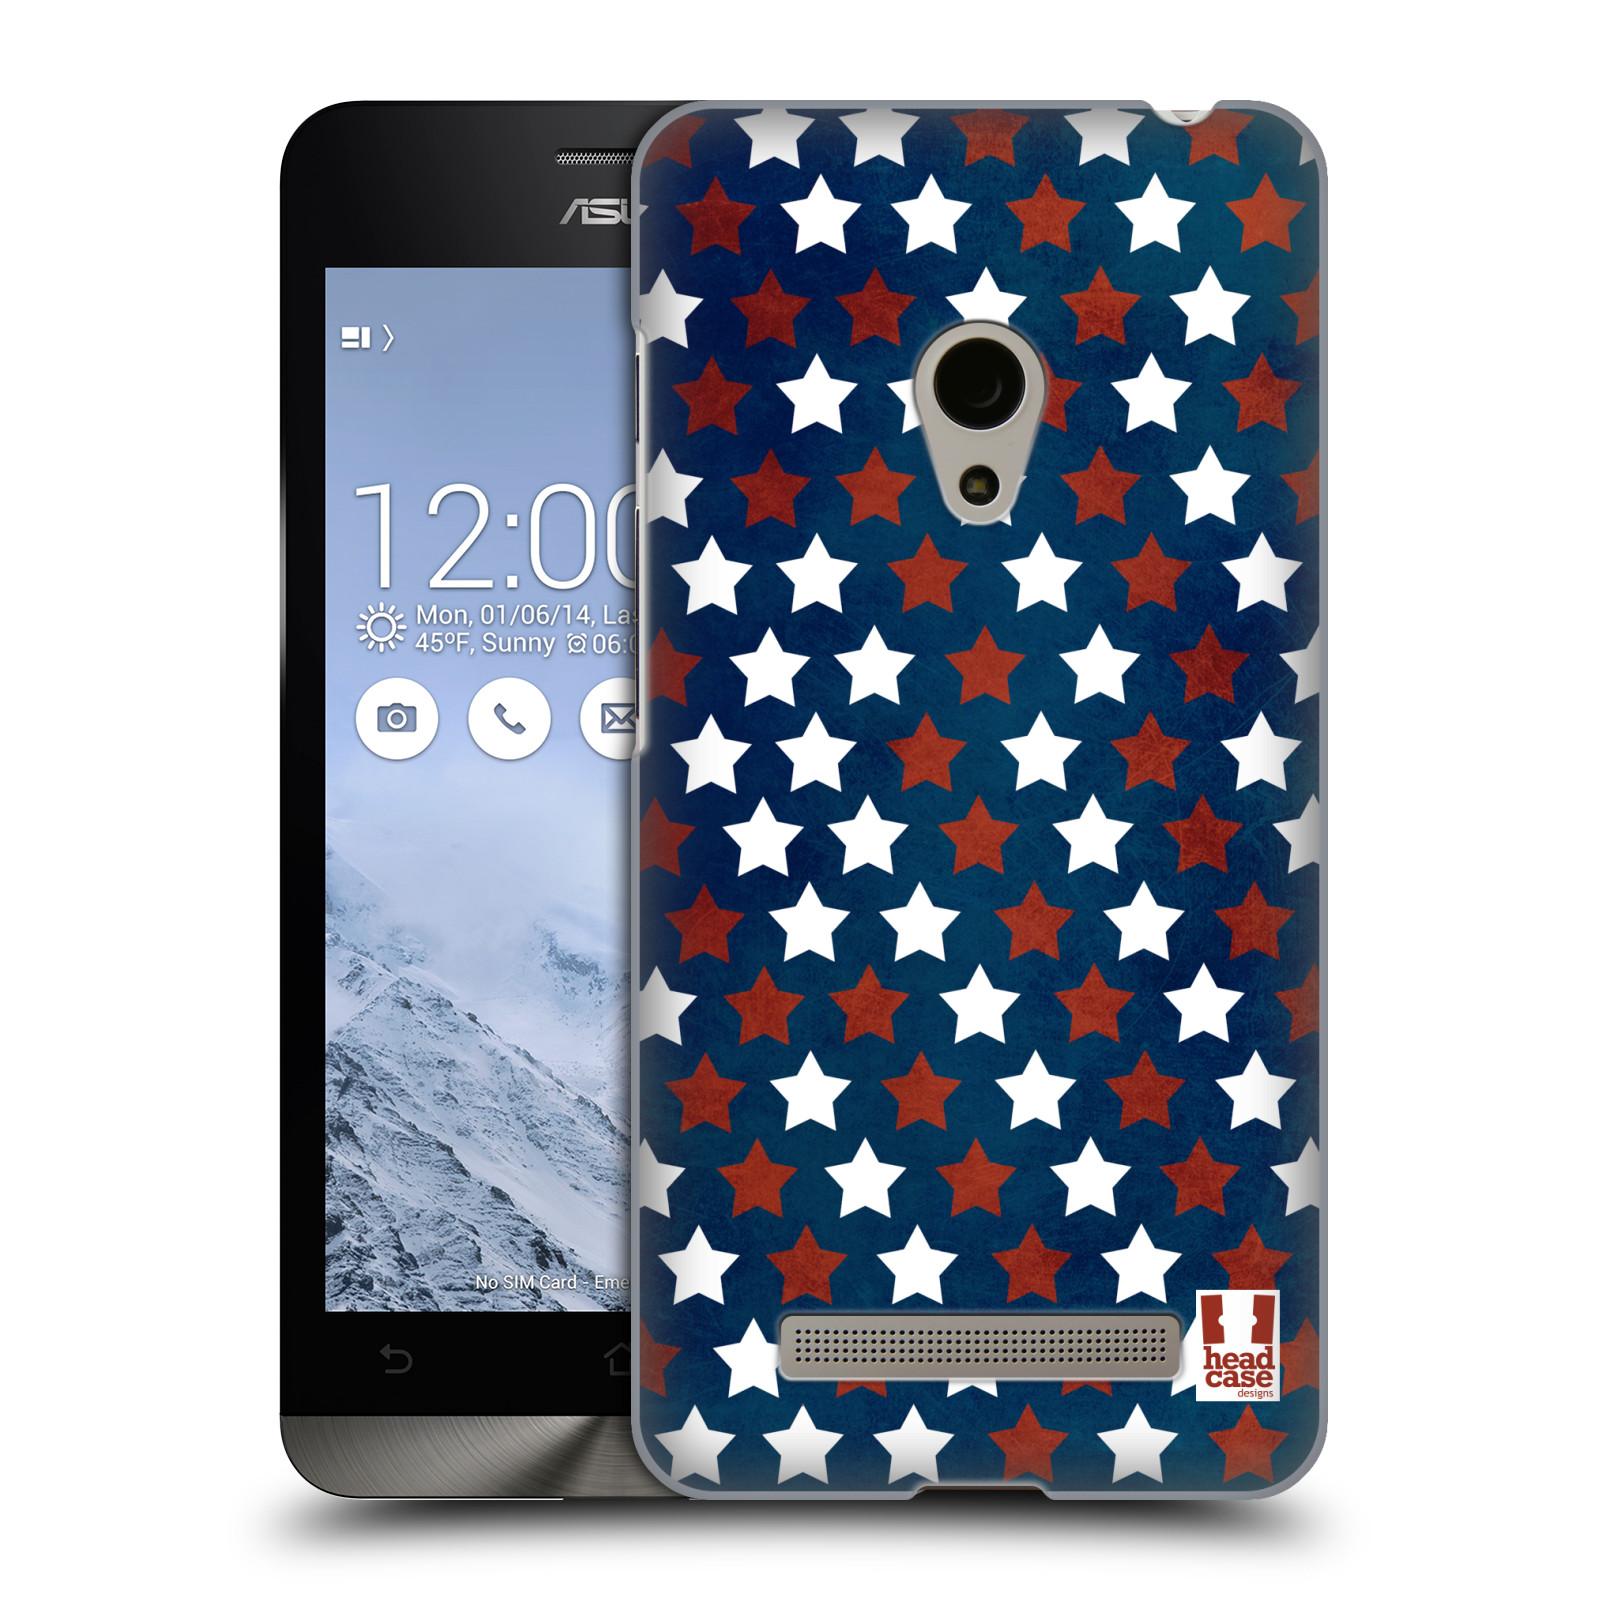 HEAD CASE plastový obal na mobil Asus Zenfone 5 vzor USA VLAJKA HVĚZDY V MODRÉM